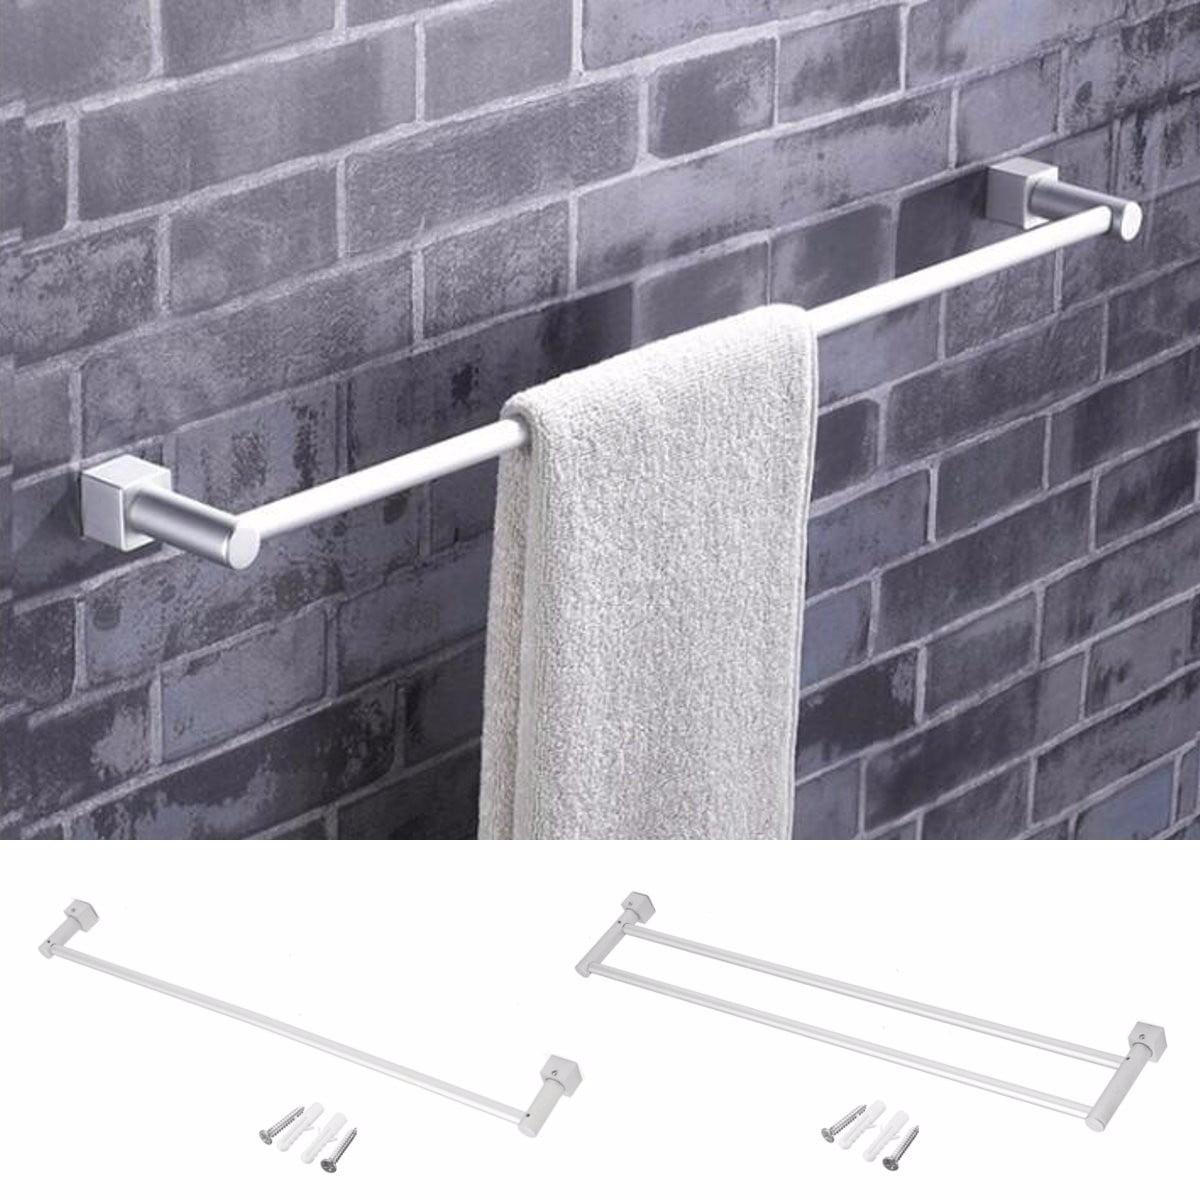 M.way Aluminum Bathroom Double Towel Rail Rack Holder 2 Bar Hanger Wall Mount Shelf